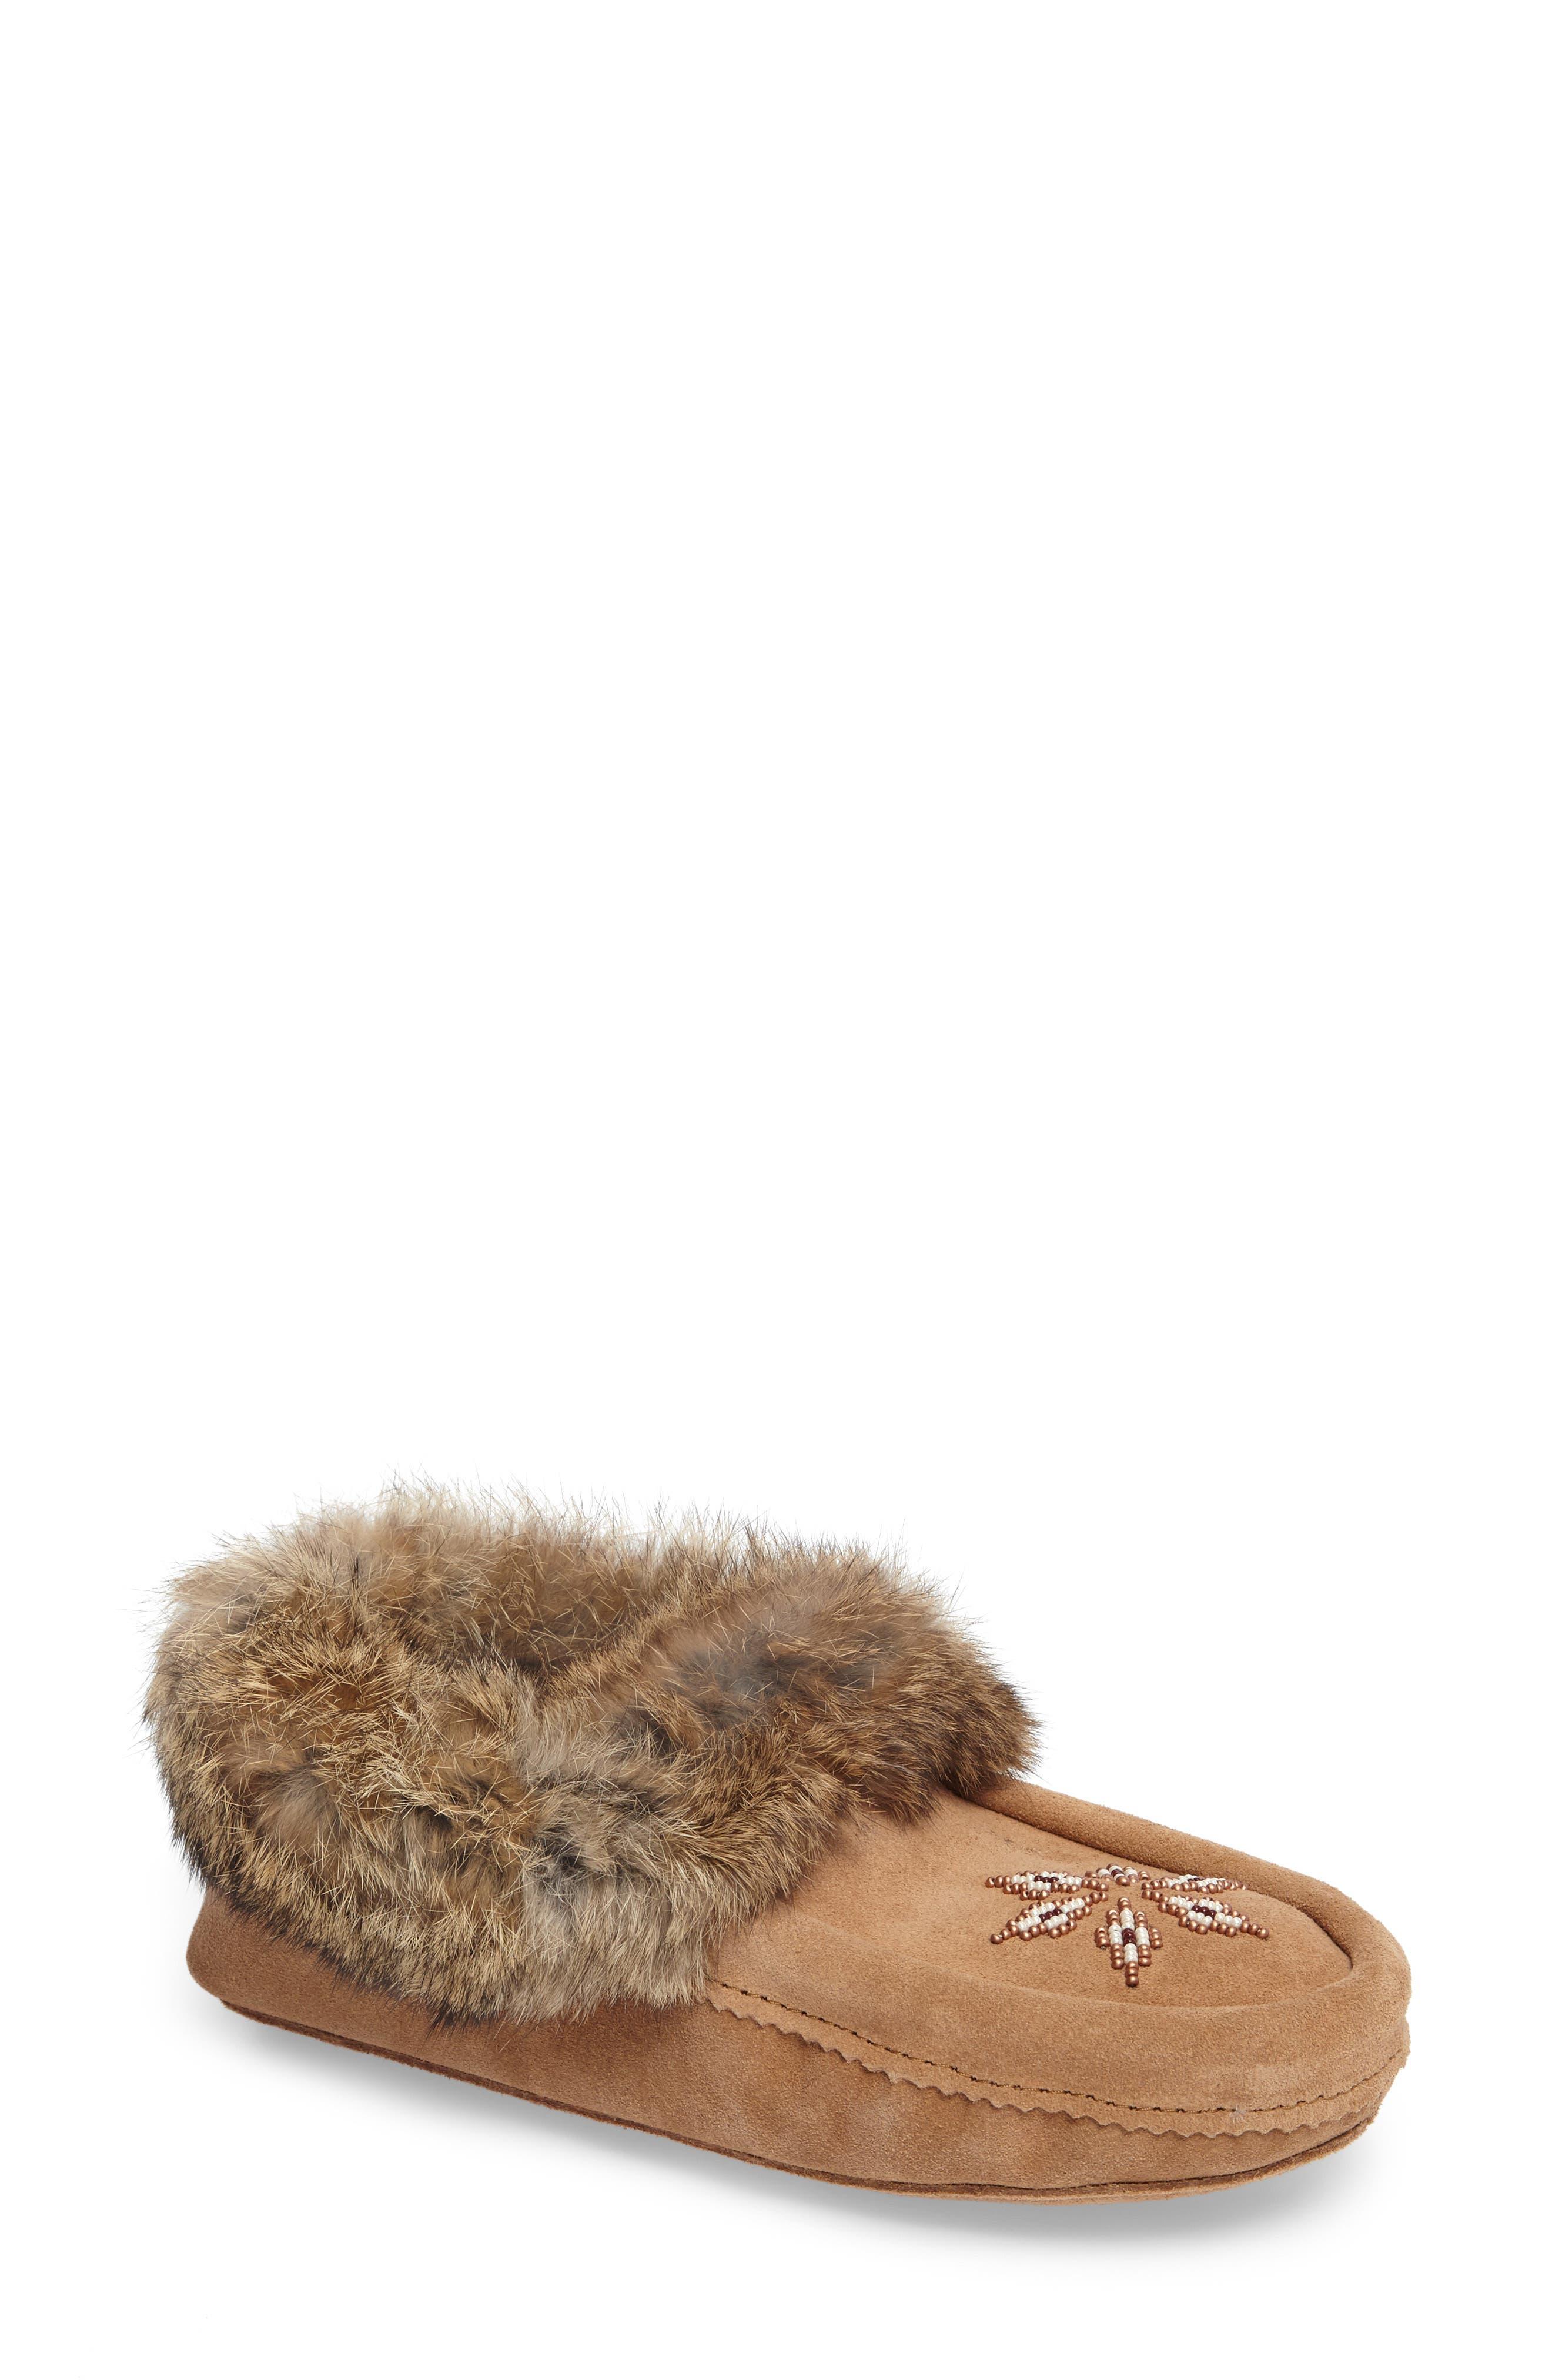 'Kanada' Genuine Rabbit Fur & Suede Moccasin Slipper,                         Main,                         color, OAK FUR